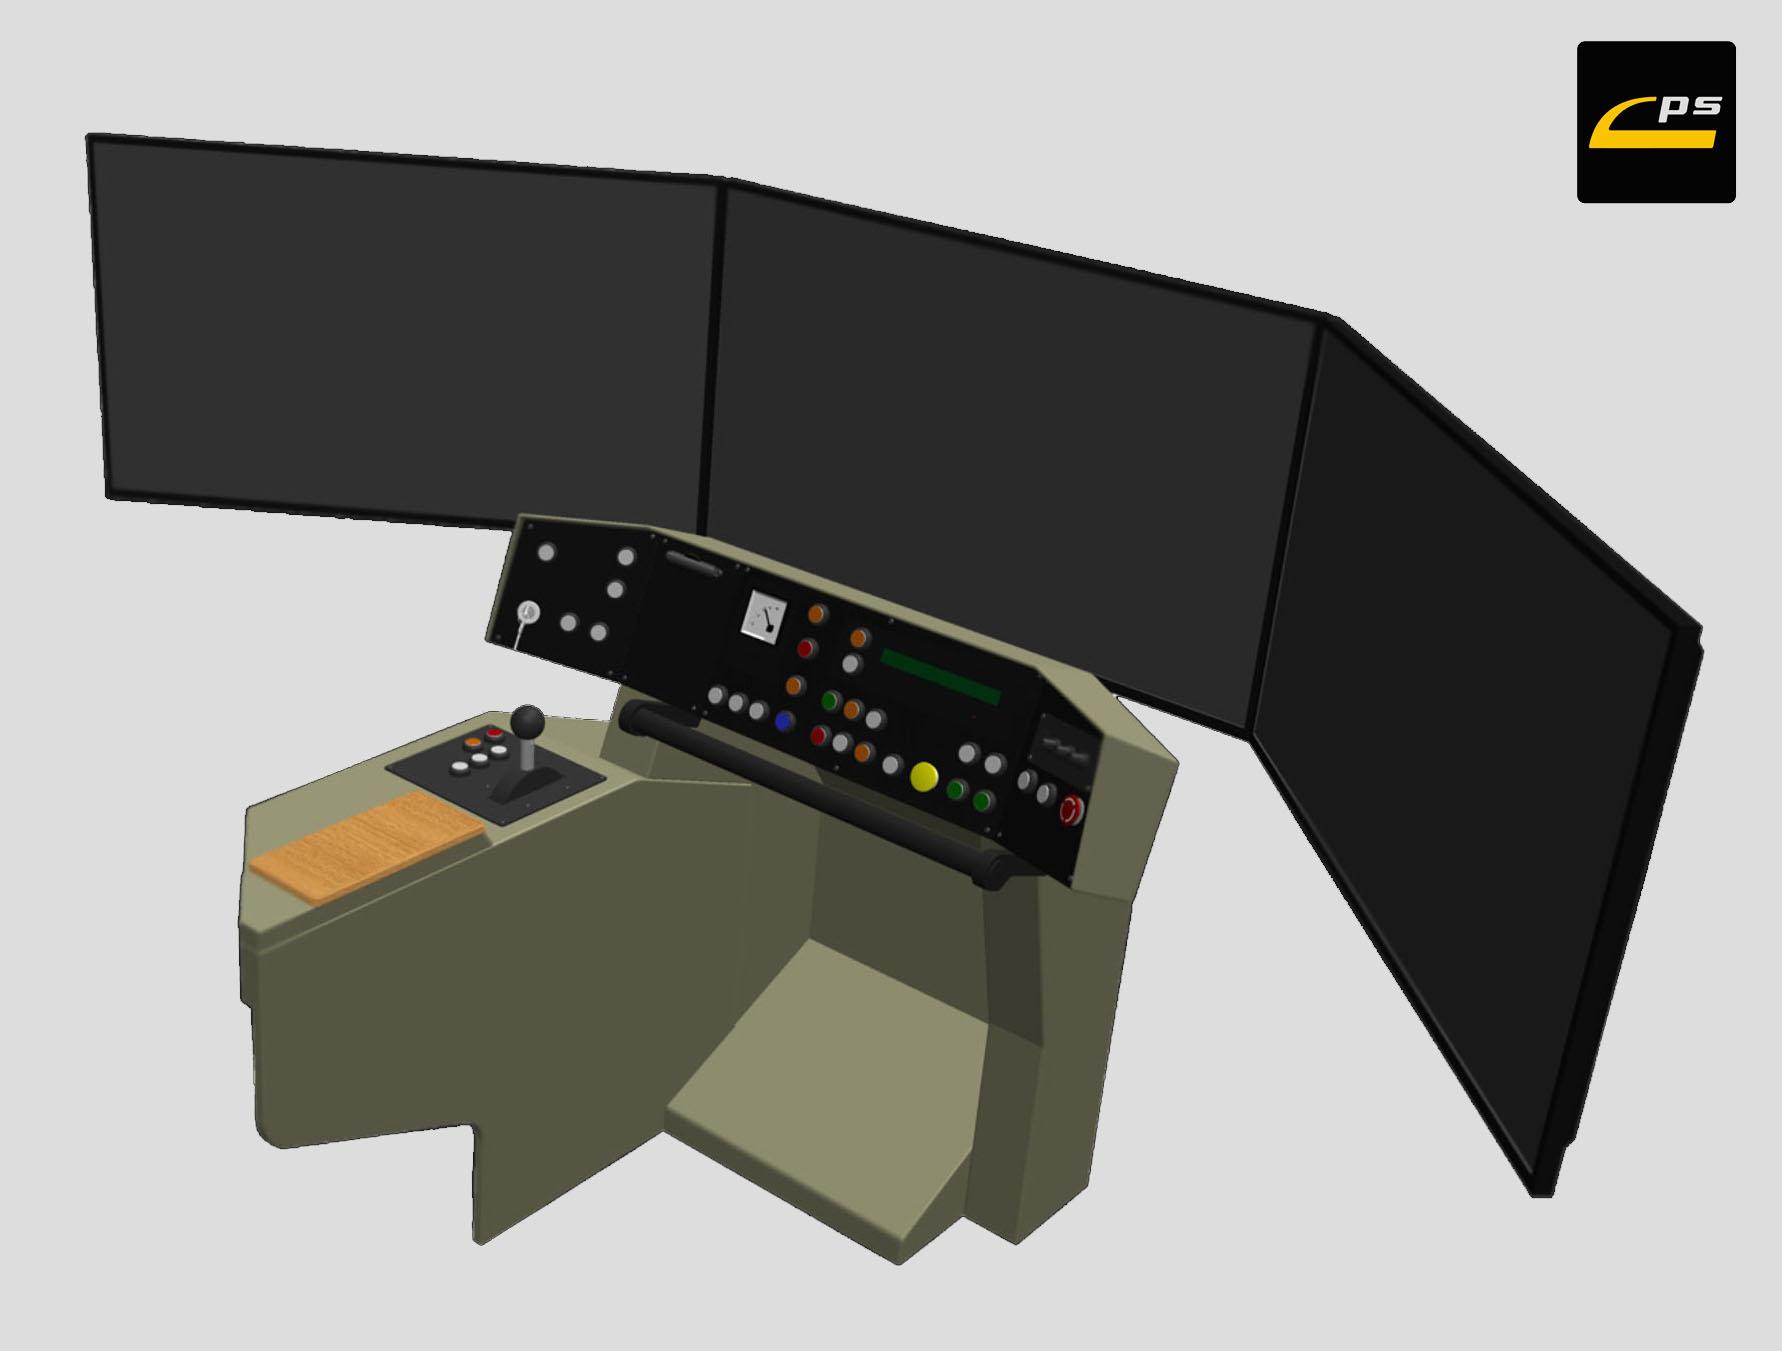 Projekcja scenerii - ADVANCED - trzy ekrany LCD